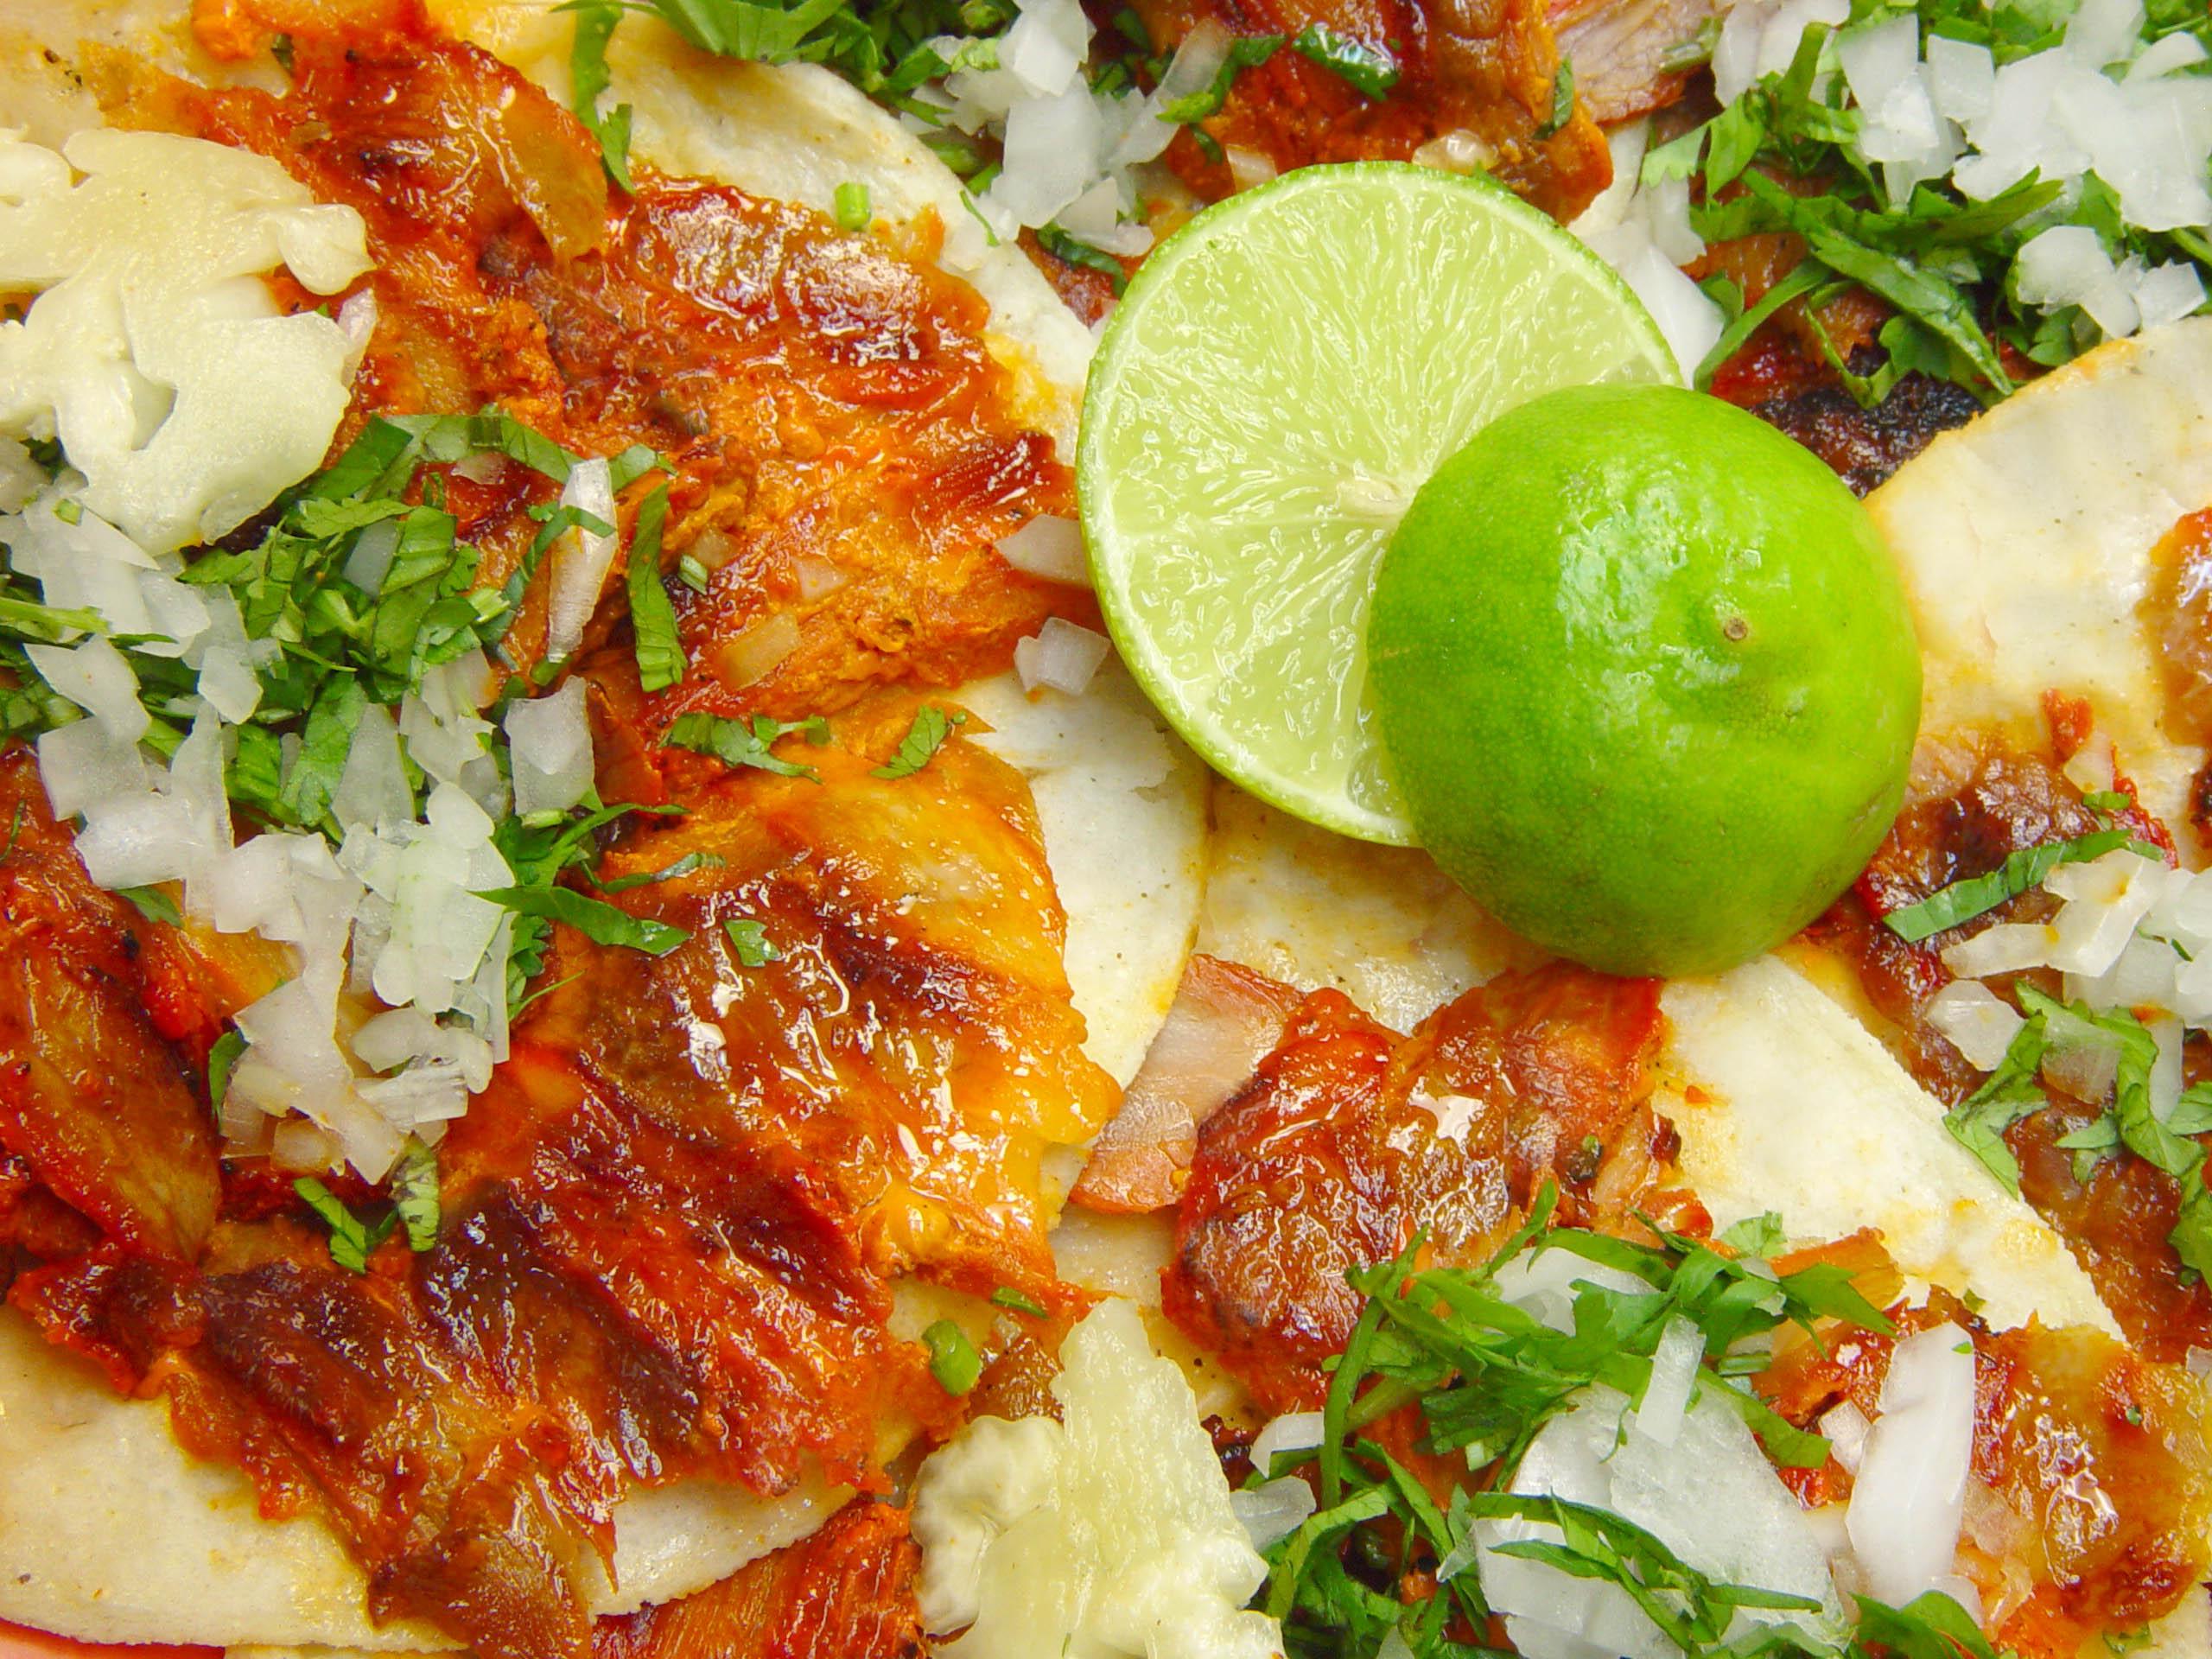 No-Waste Tacos De Carnitas With Salsa Verde Recipes — Dishmaps